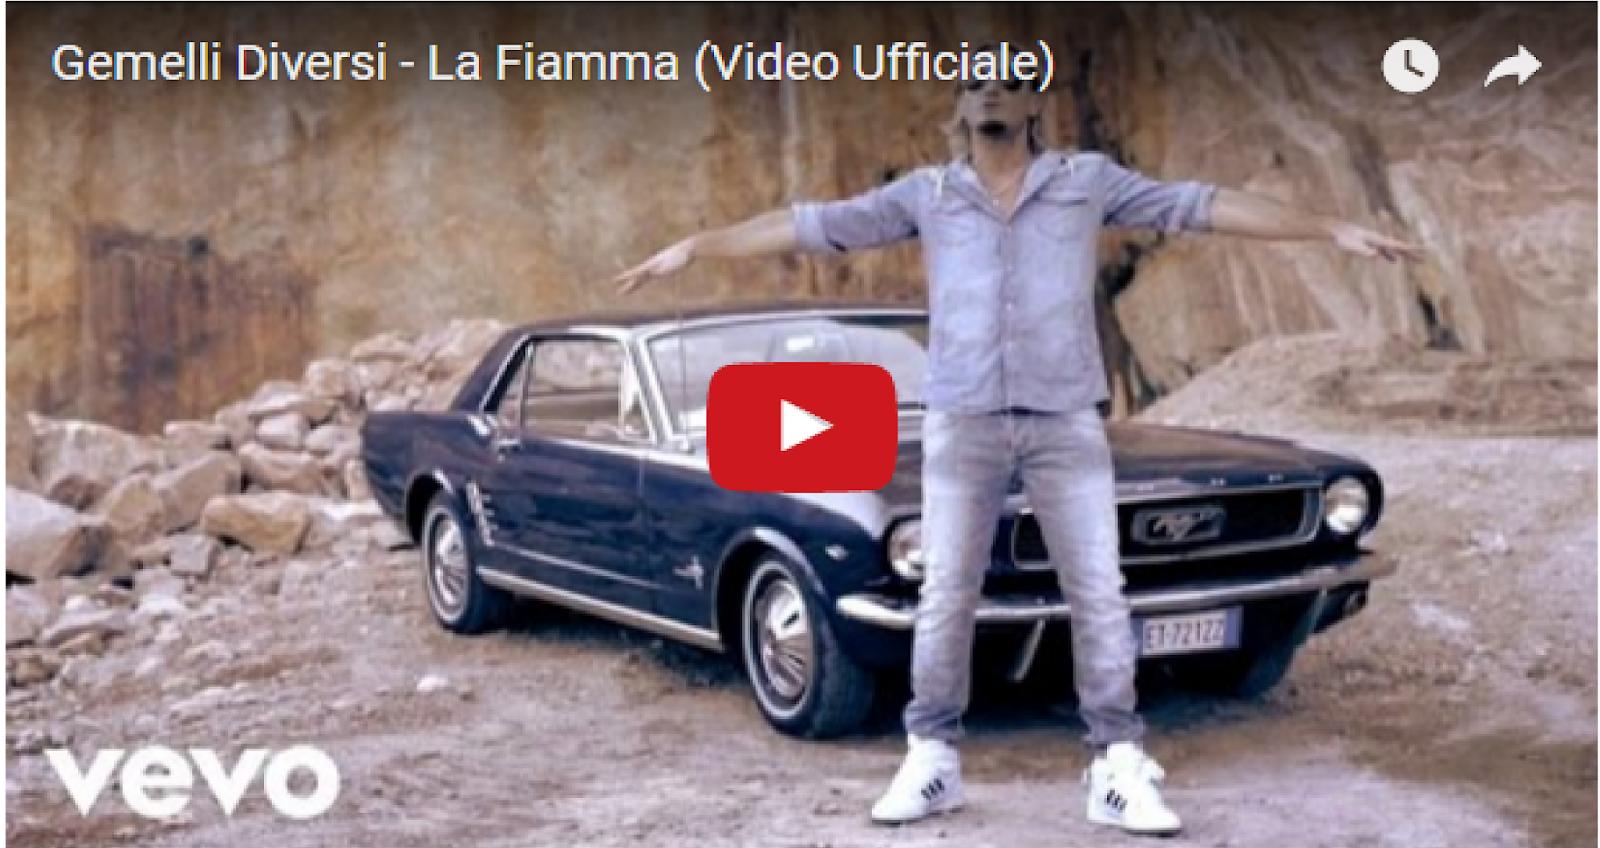 L 39 amore per la musica gemelli diversi la fiamma video - Gemelli diversi video ...